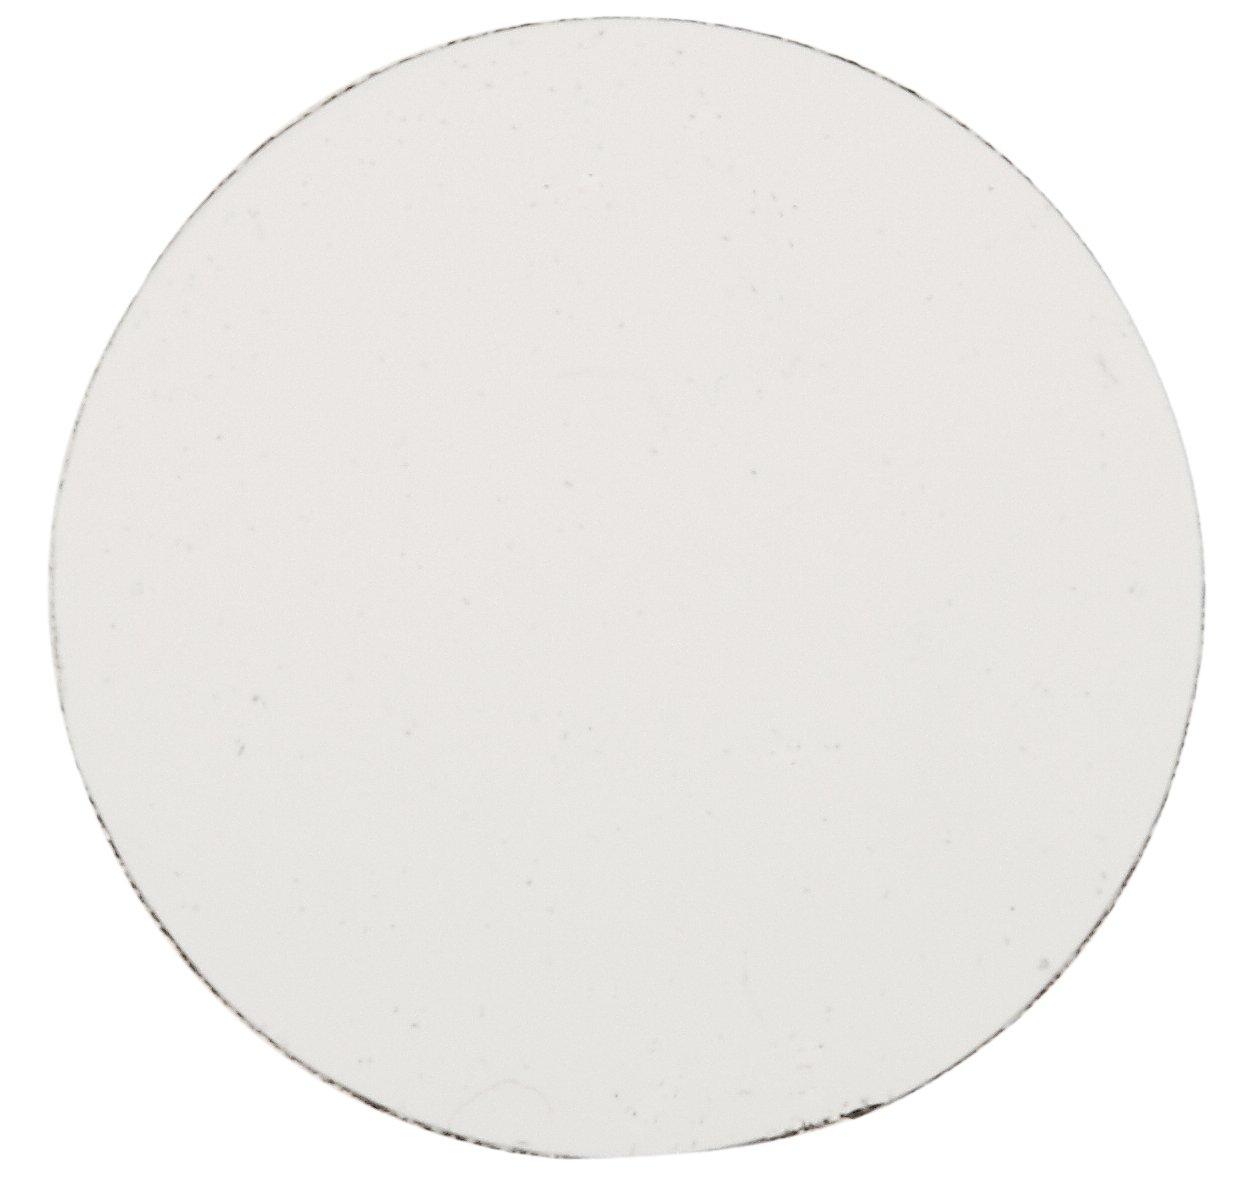 5mm Diameter Bellco Glass 1943-00005 Float Glass Round Cover Slip #1 Thickness 100 cover slips